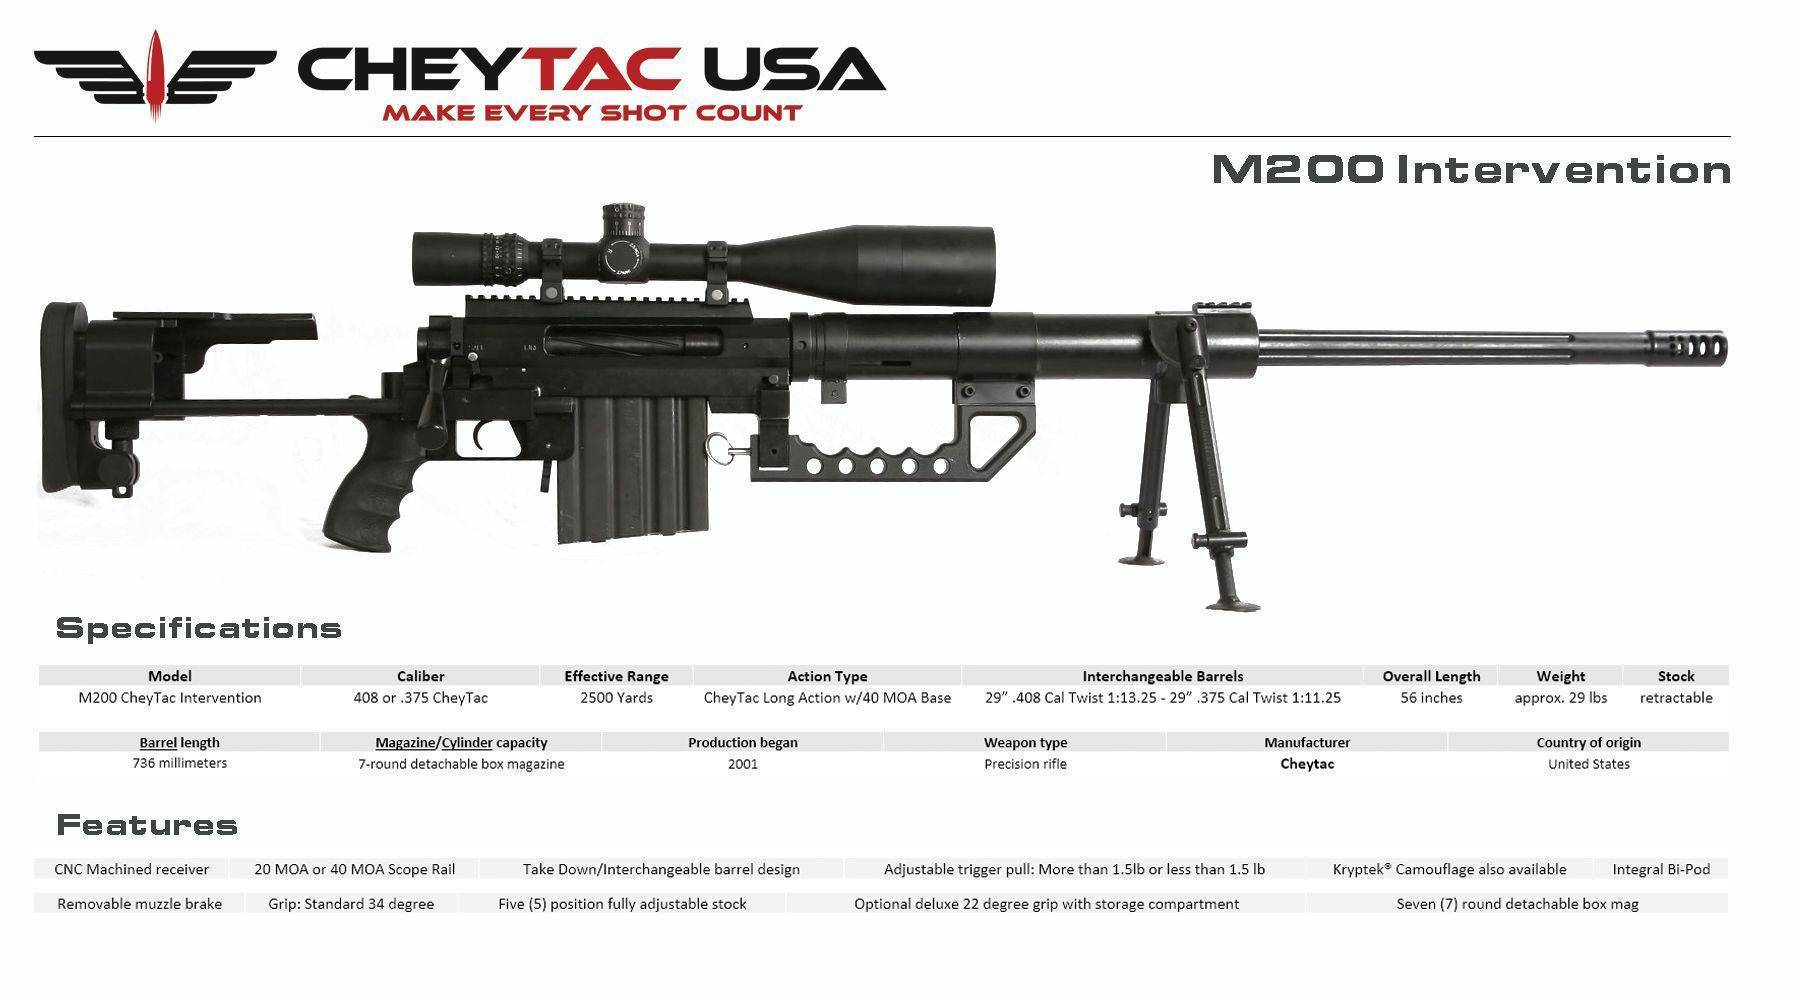 Cheytac defender снайперская винтовка — характеристики, фото, ттх